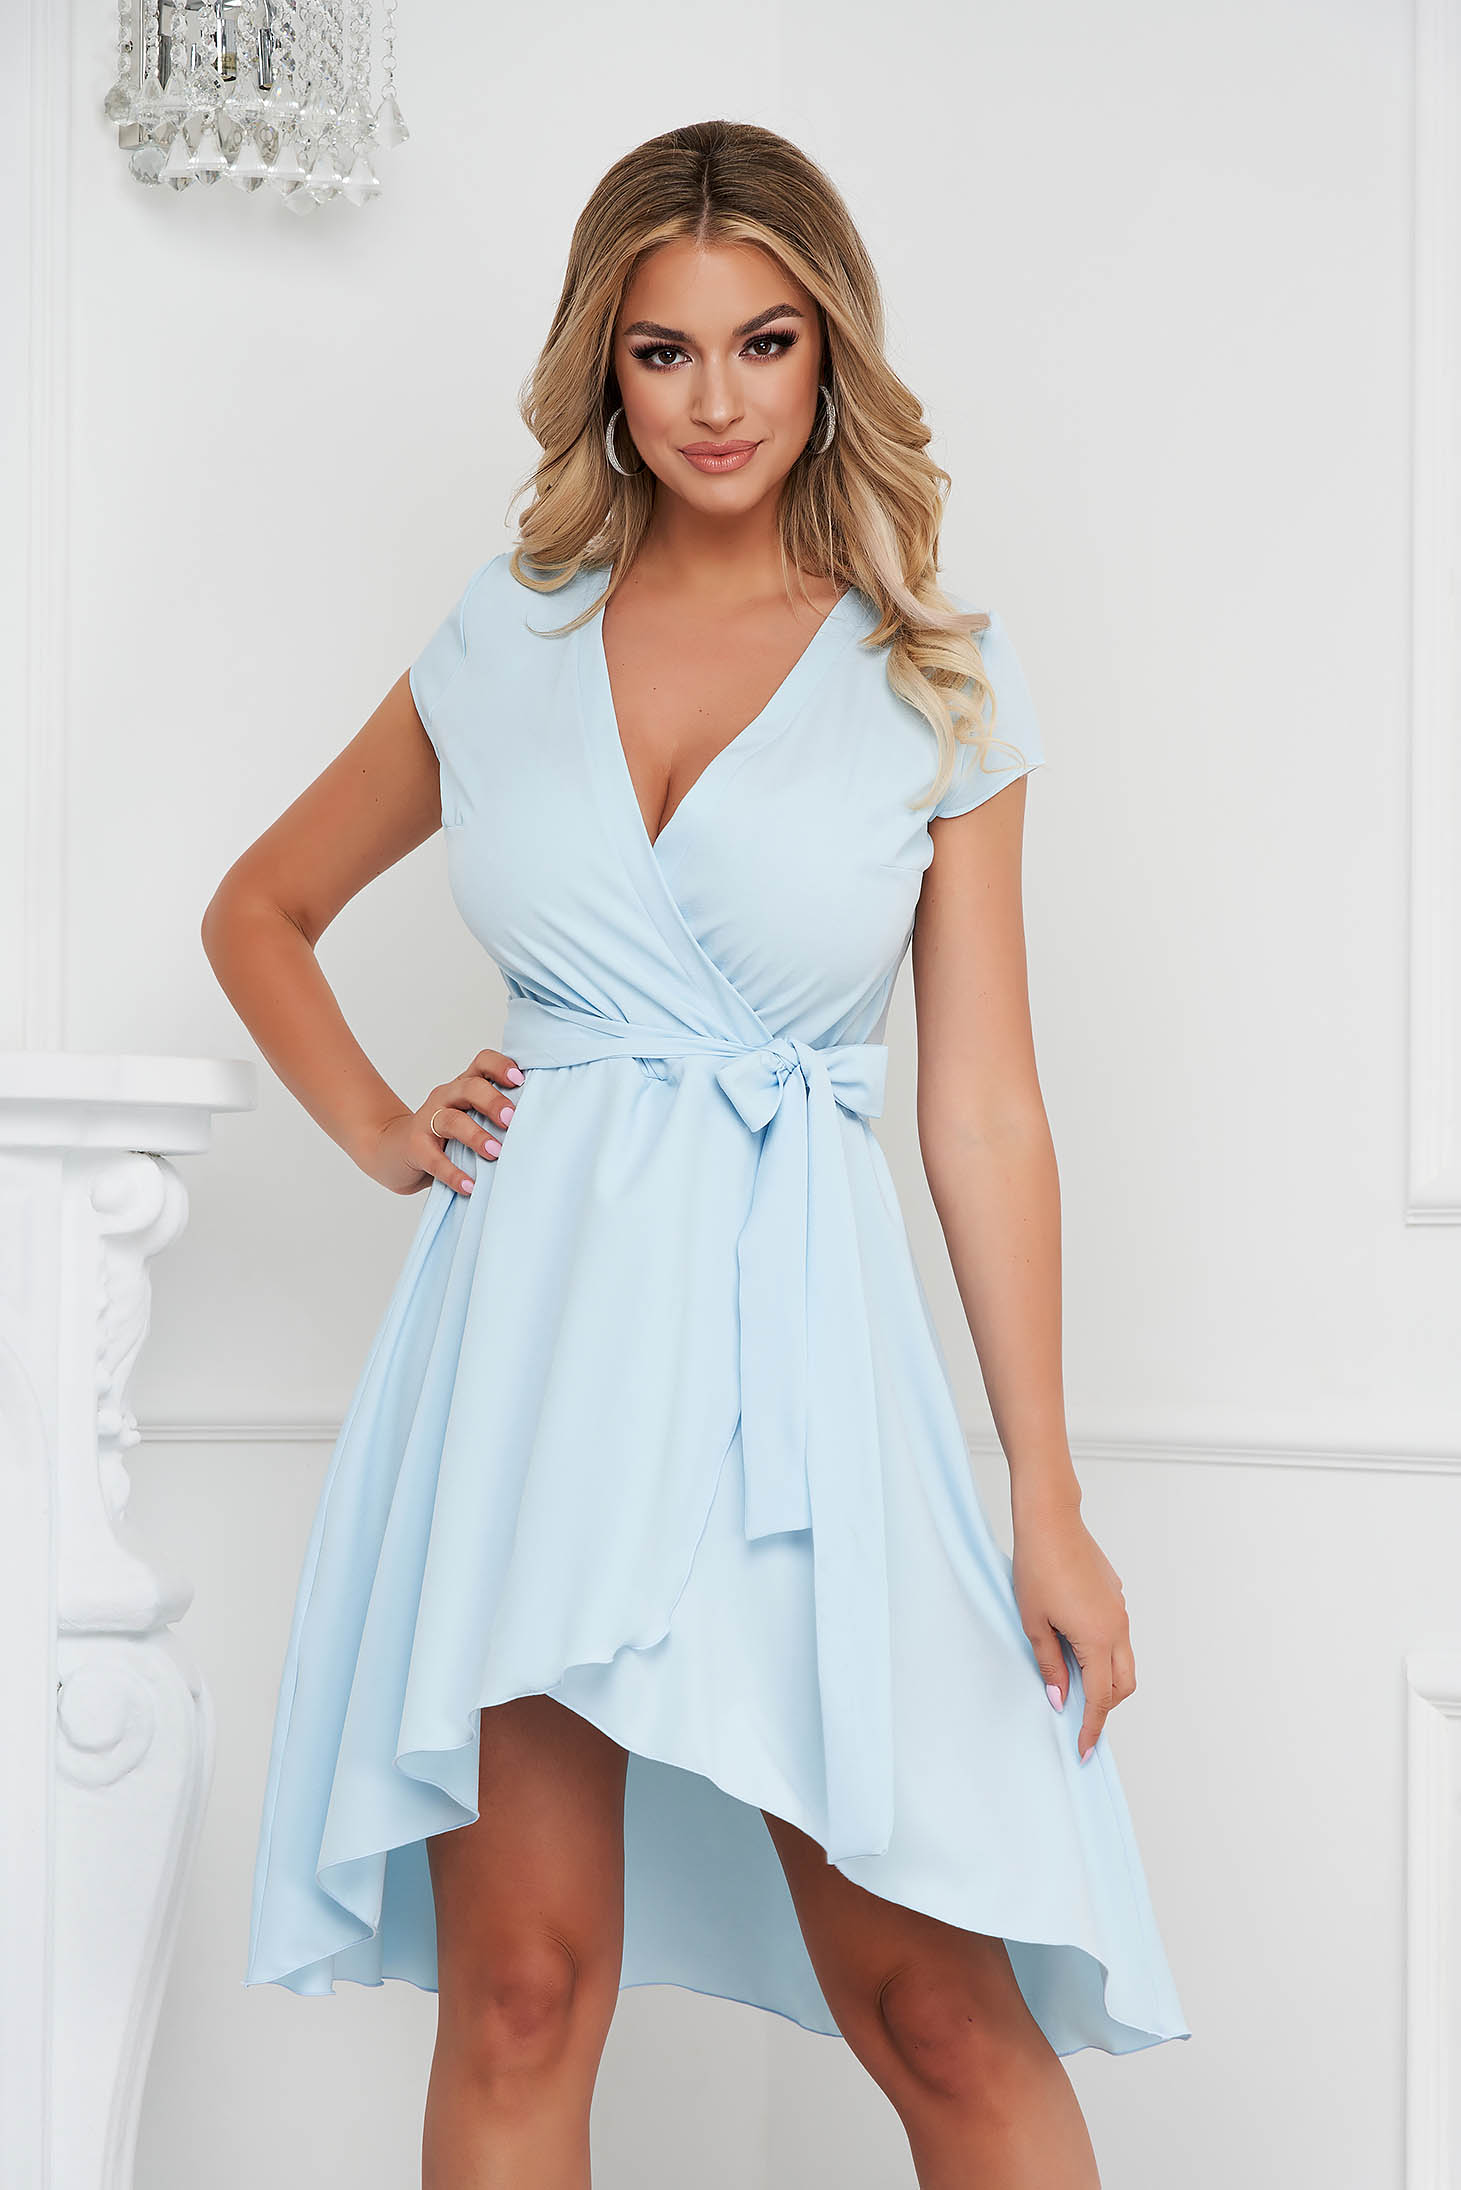 StarShinerS lightblue dress asymmetrical slightly elastic fabric with deep cleavage